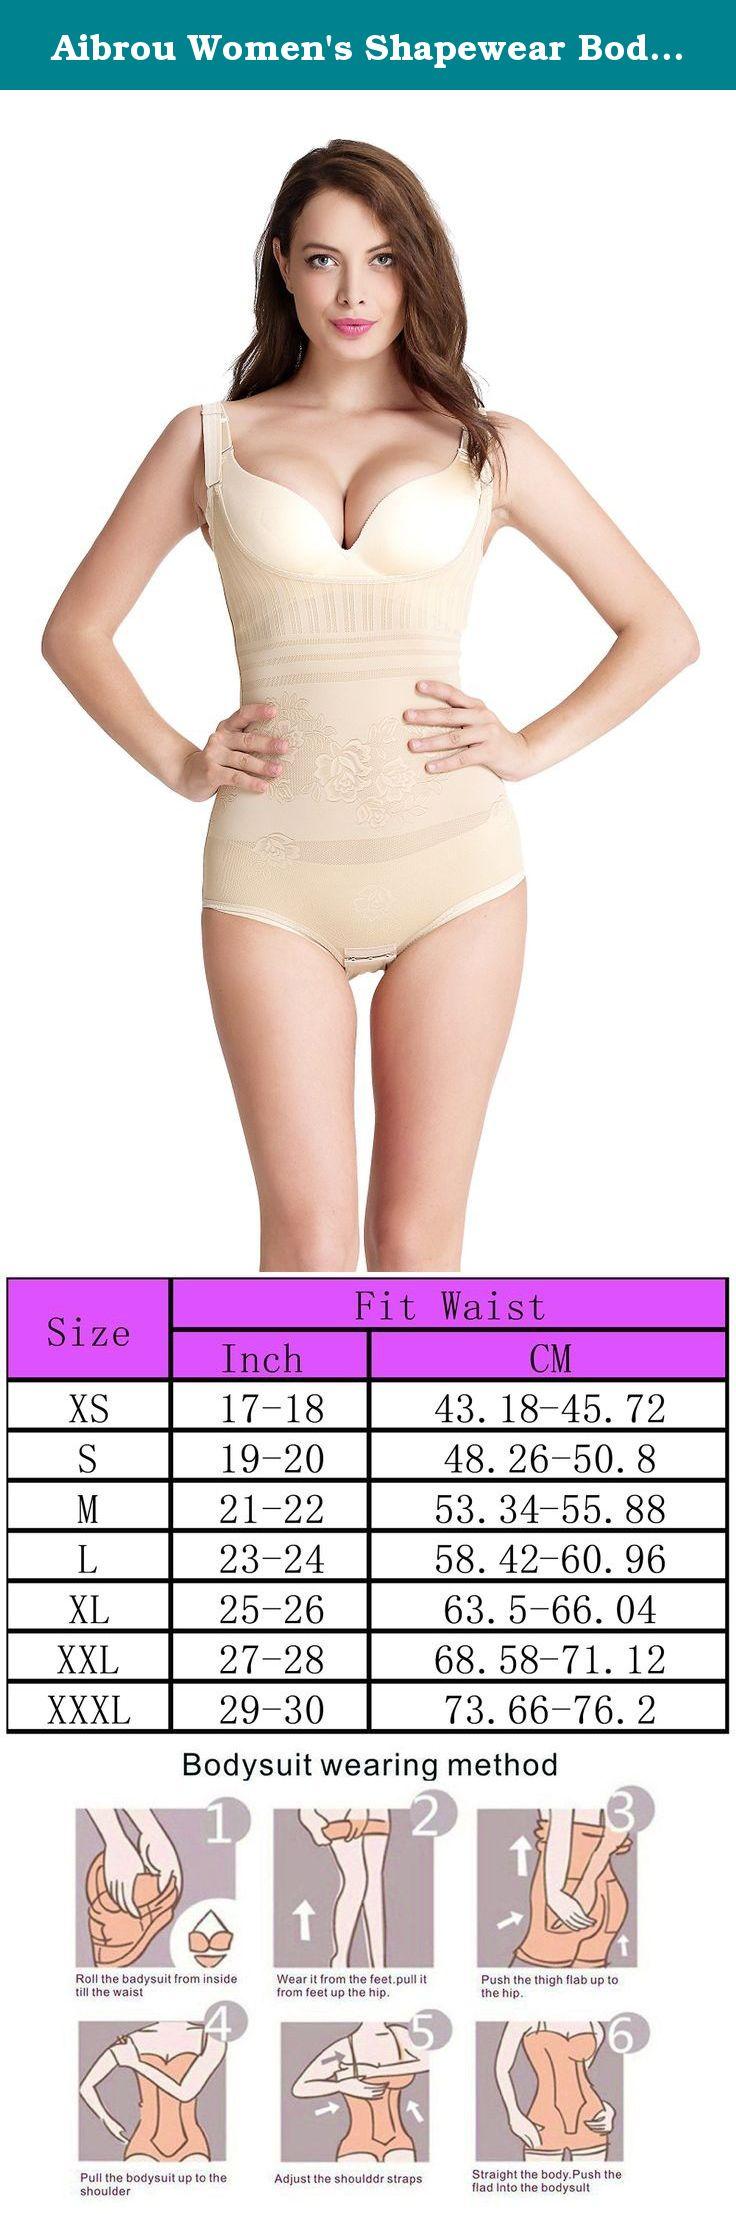 b13dba1626148 Aibrou Women s Shapewear Body Briefer Slimmer Full Body Shaper(Apricot